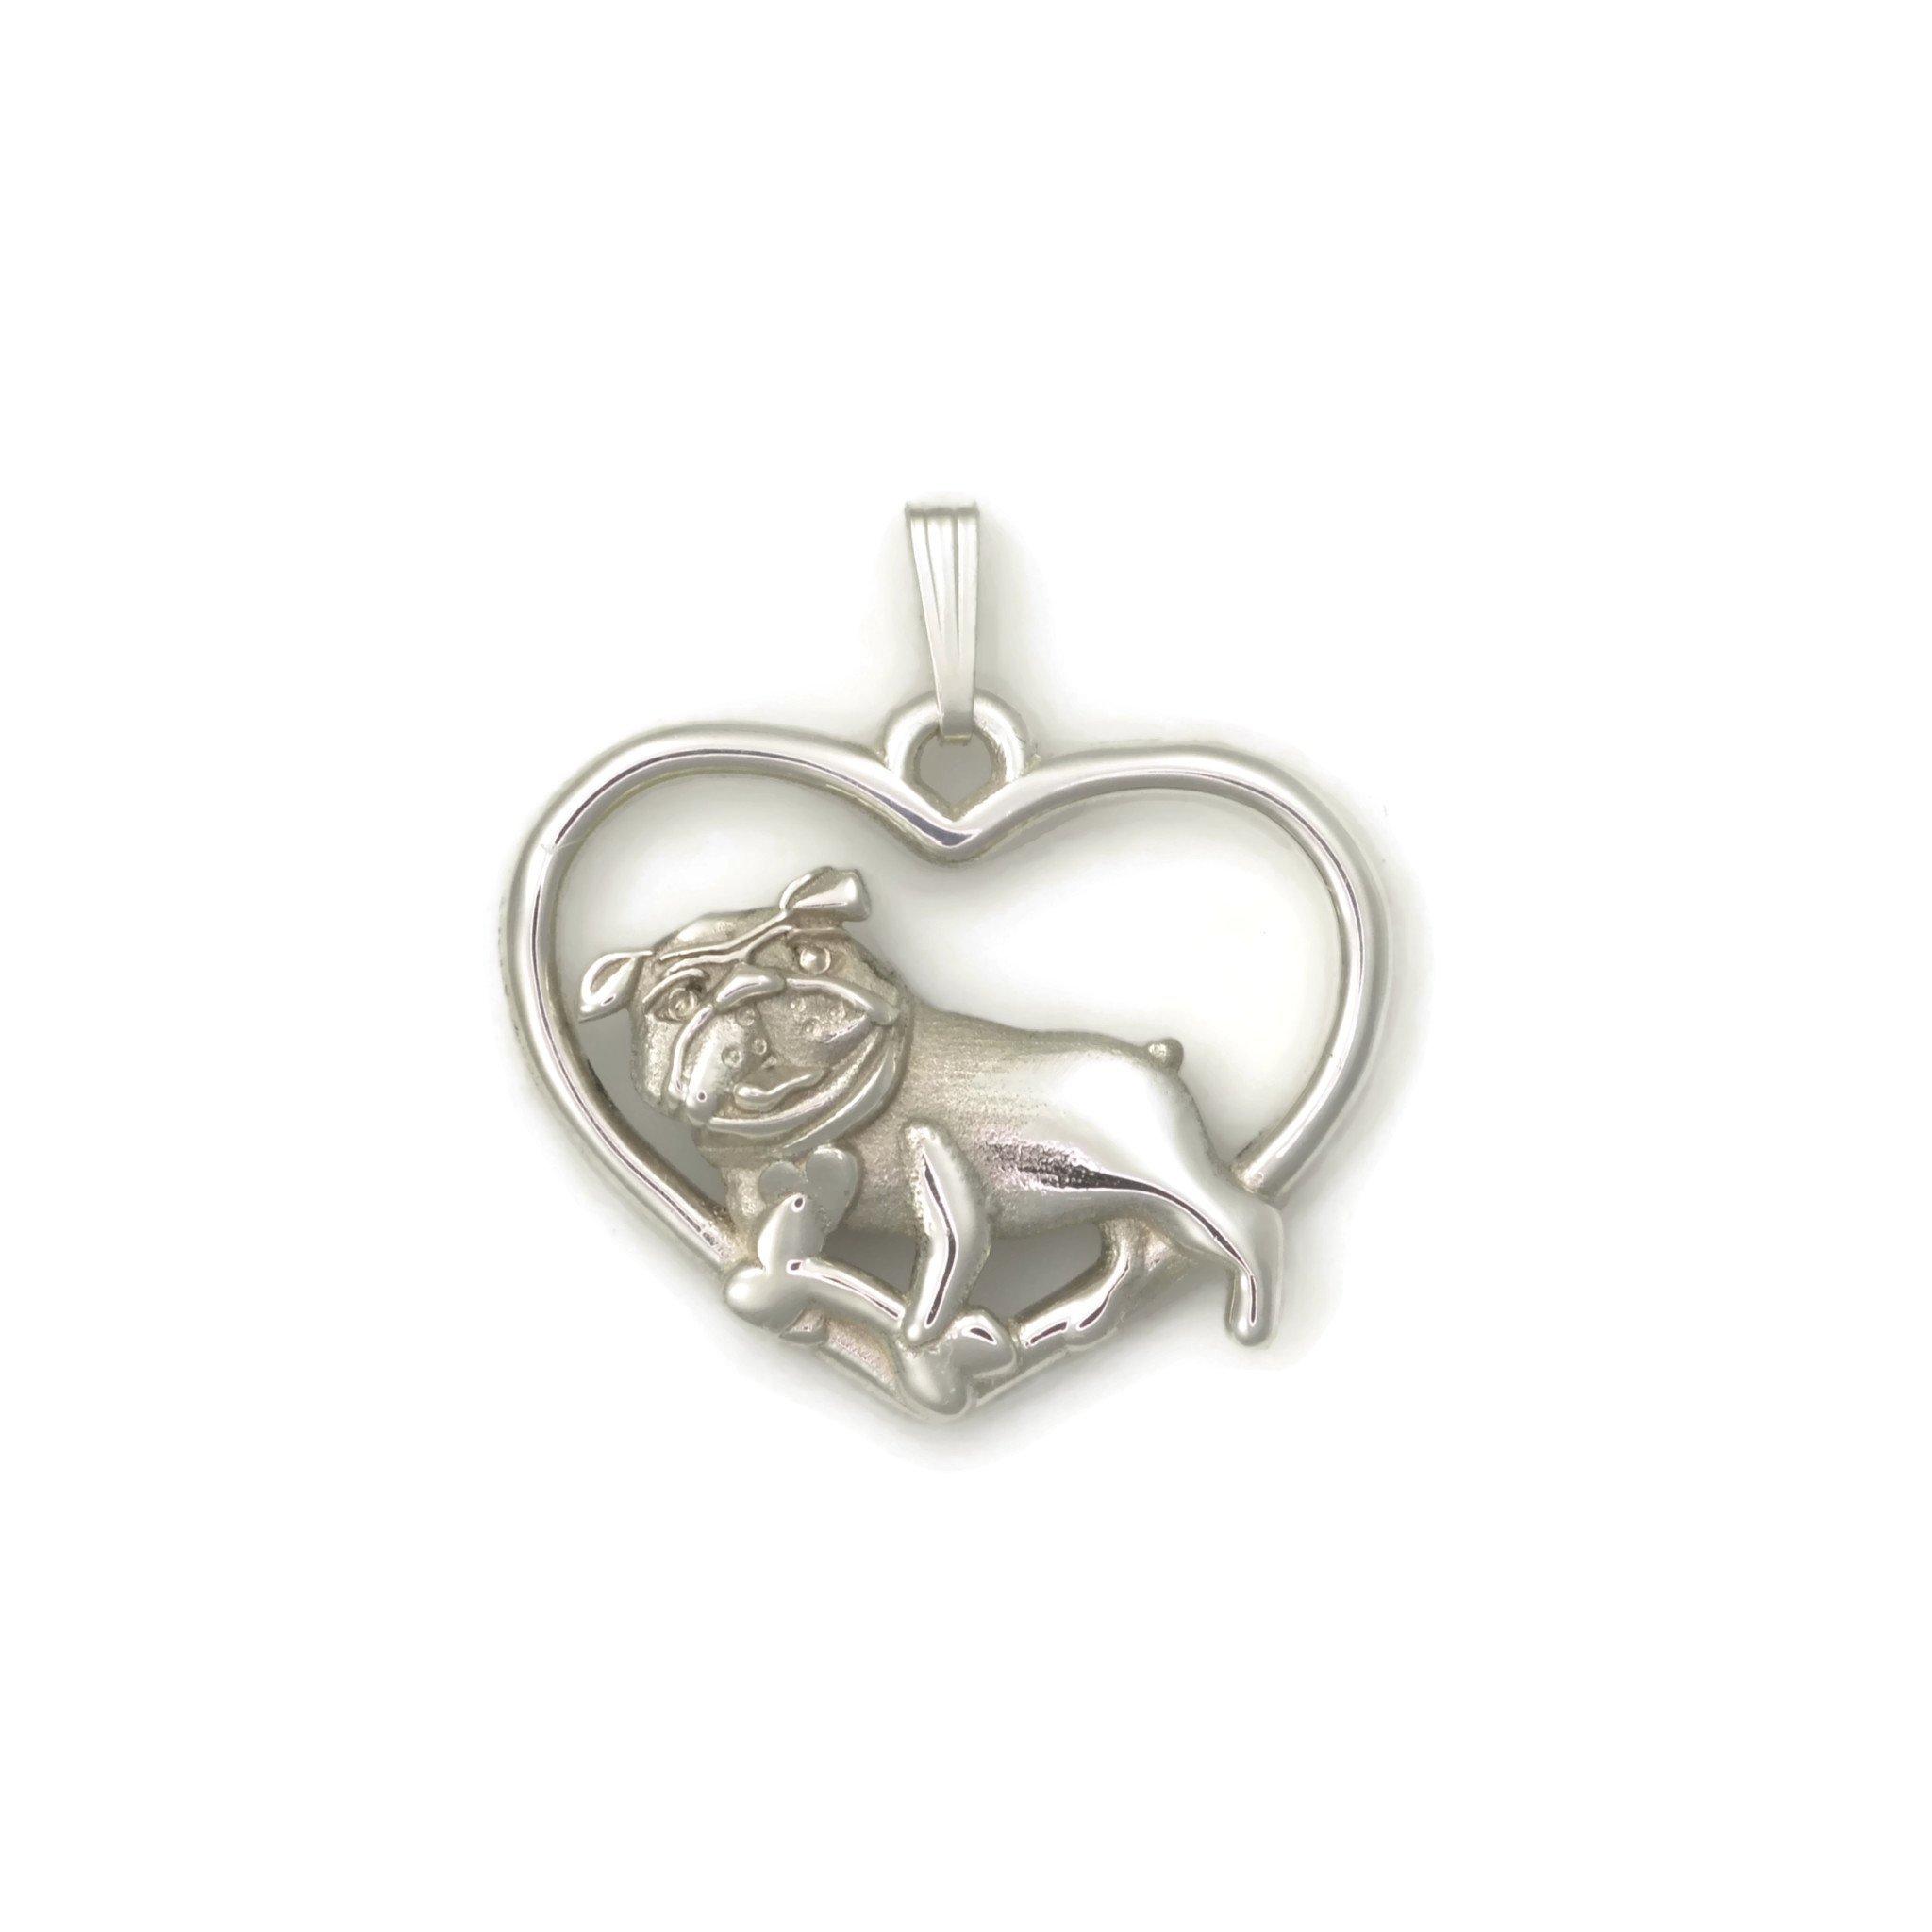 Sterling Silver Bulldog Necklace, Silver Bulldog Pendant fr Donna Pizarro's Animal Whimsey Collection of Fine Bulldog Jewelry